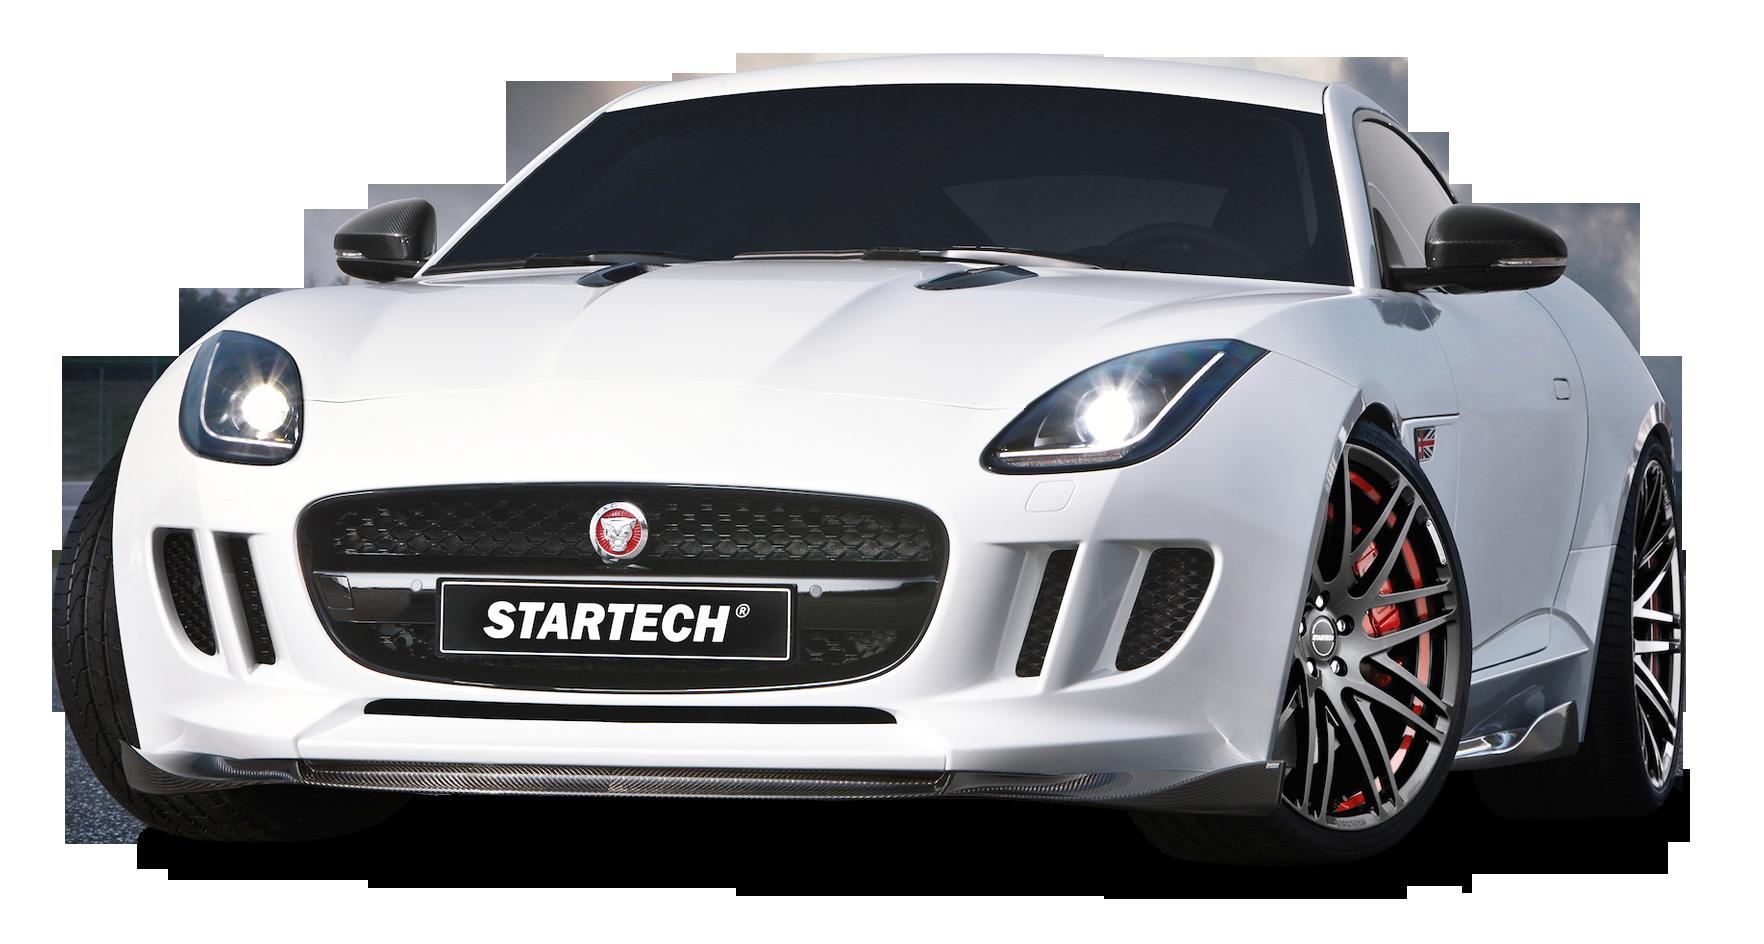 White Startech Jaguar F Type Coupe Sports Car Png Image Purepng